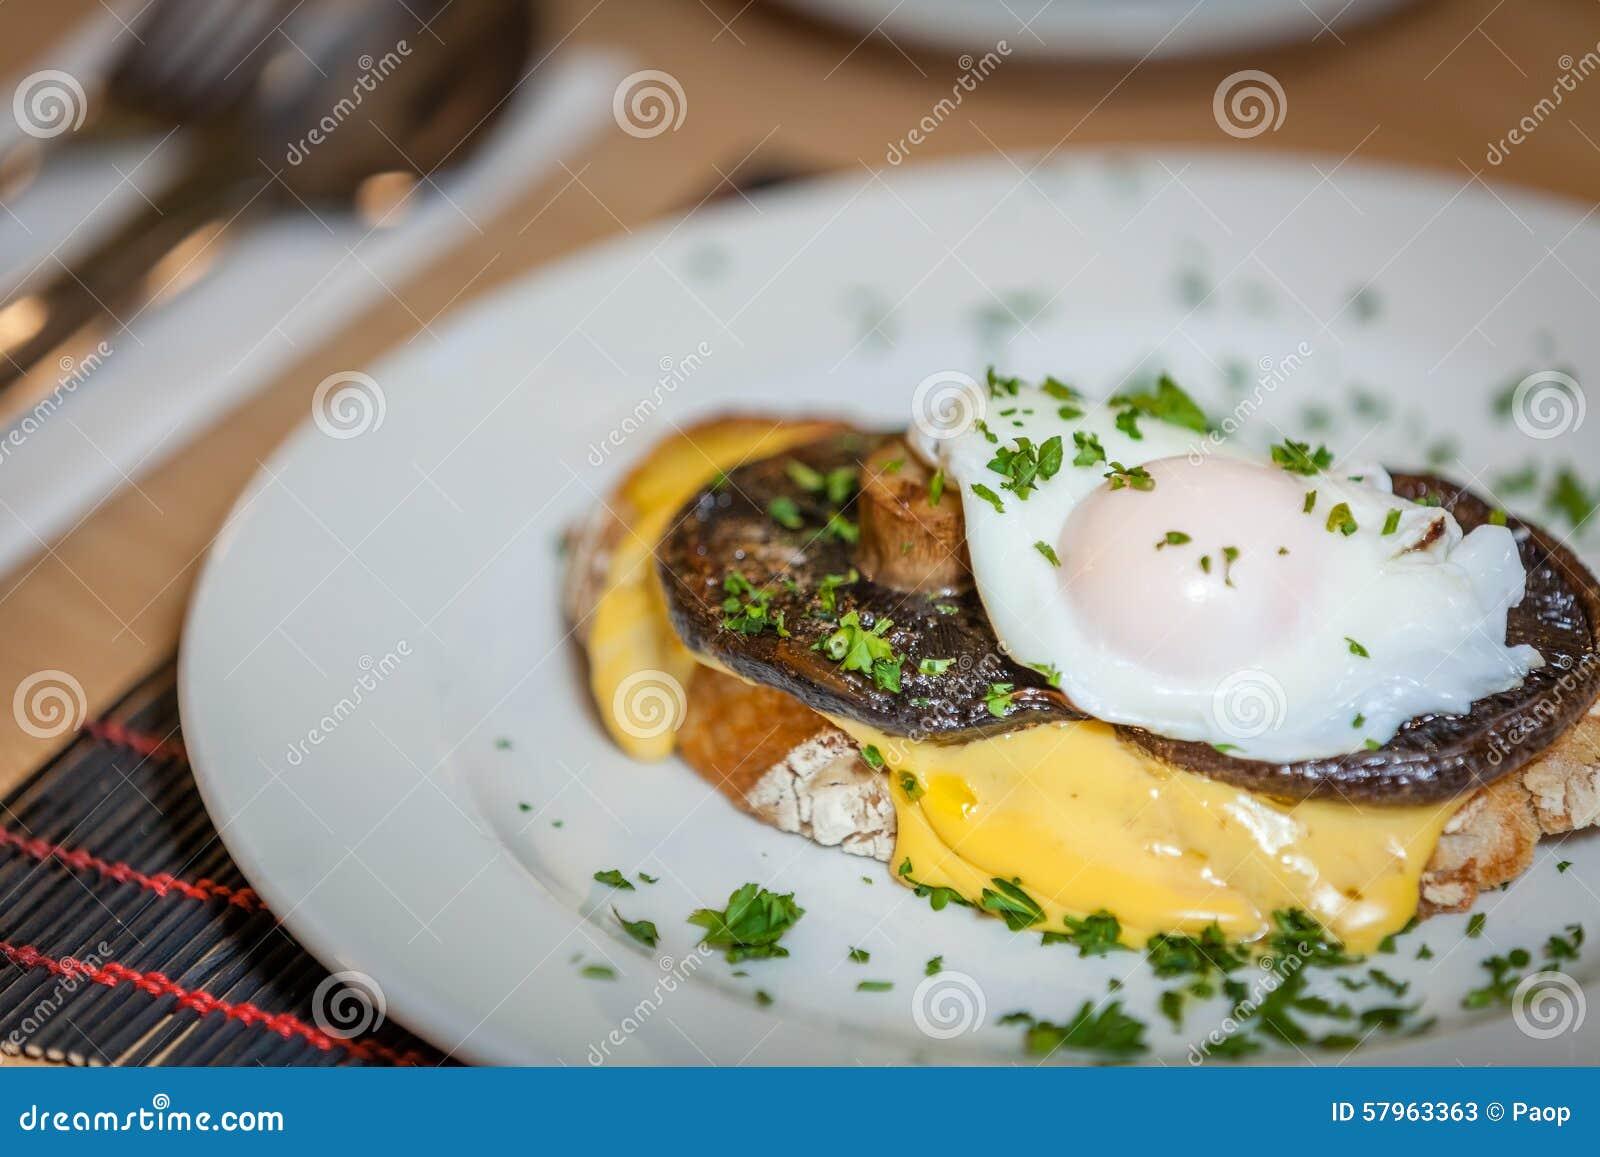 Mushroom Egg Benedict Sandwich Stock Photo - Image: 57963363